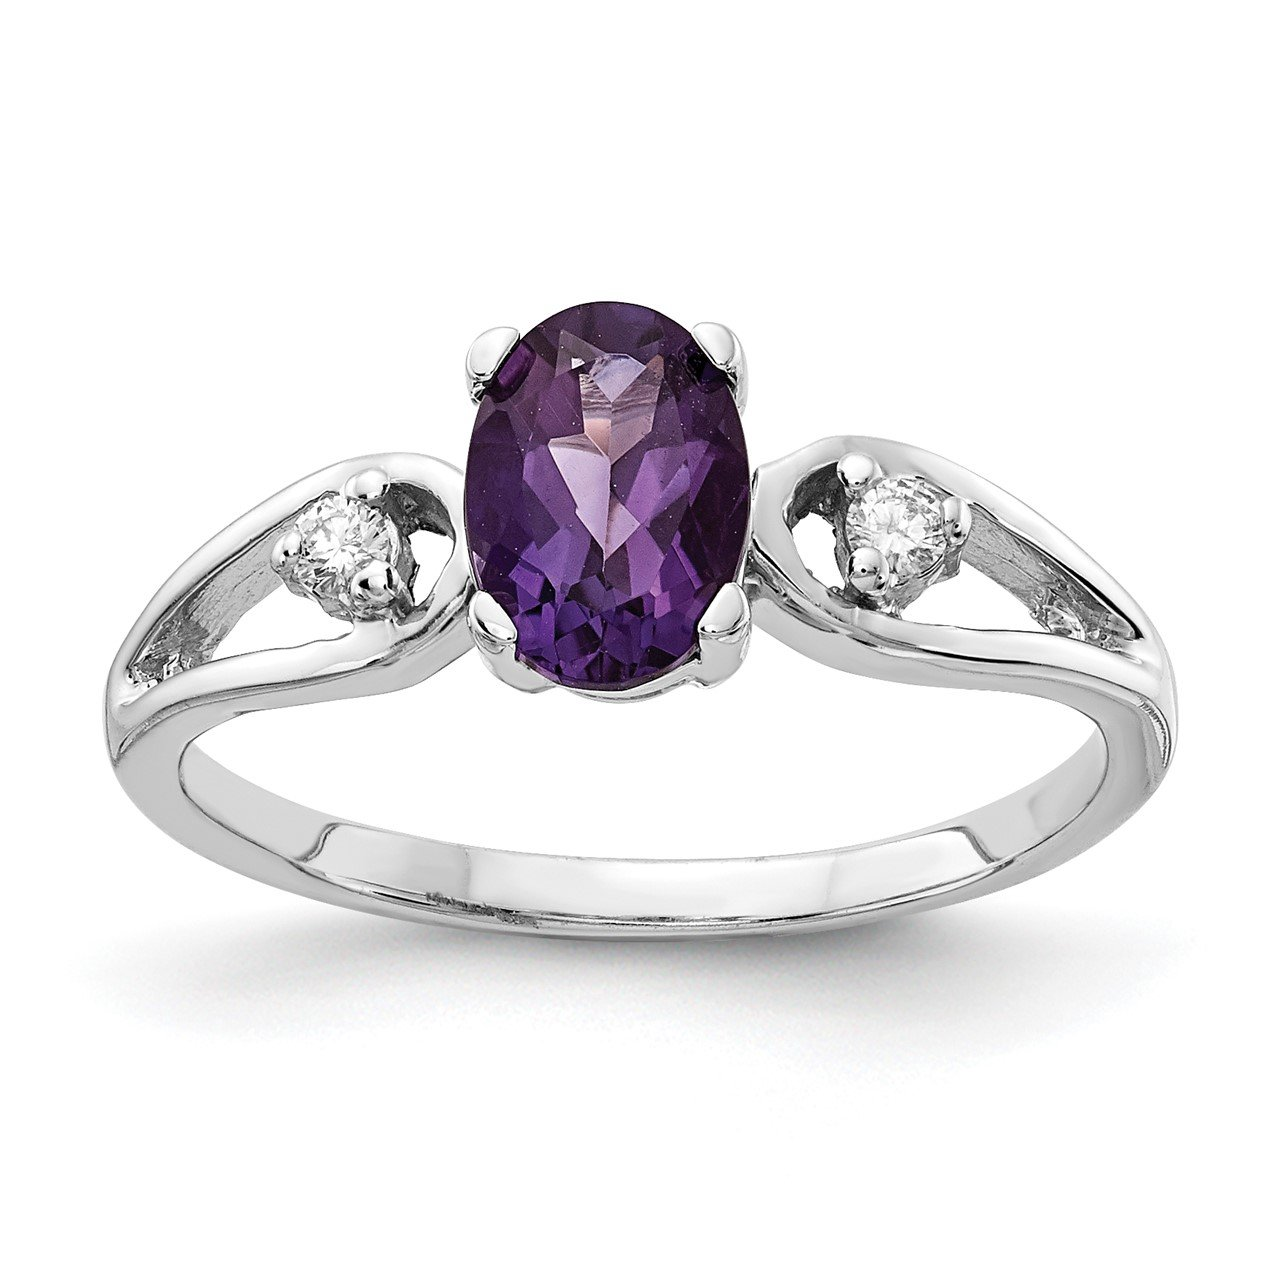 14k White Gold 7x5mm Oval Amethyst A Diamond ring